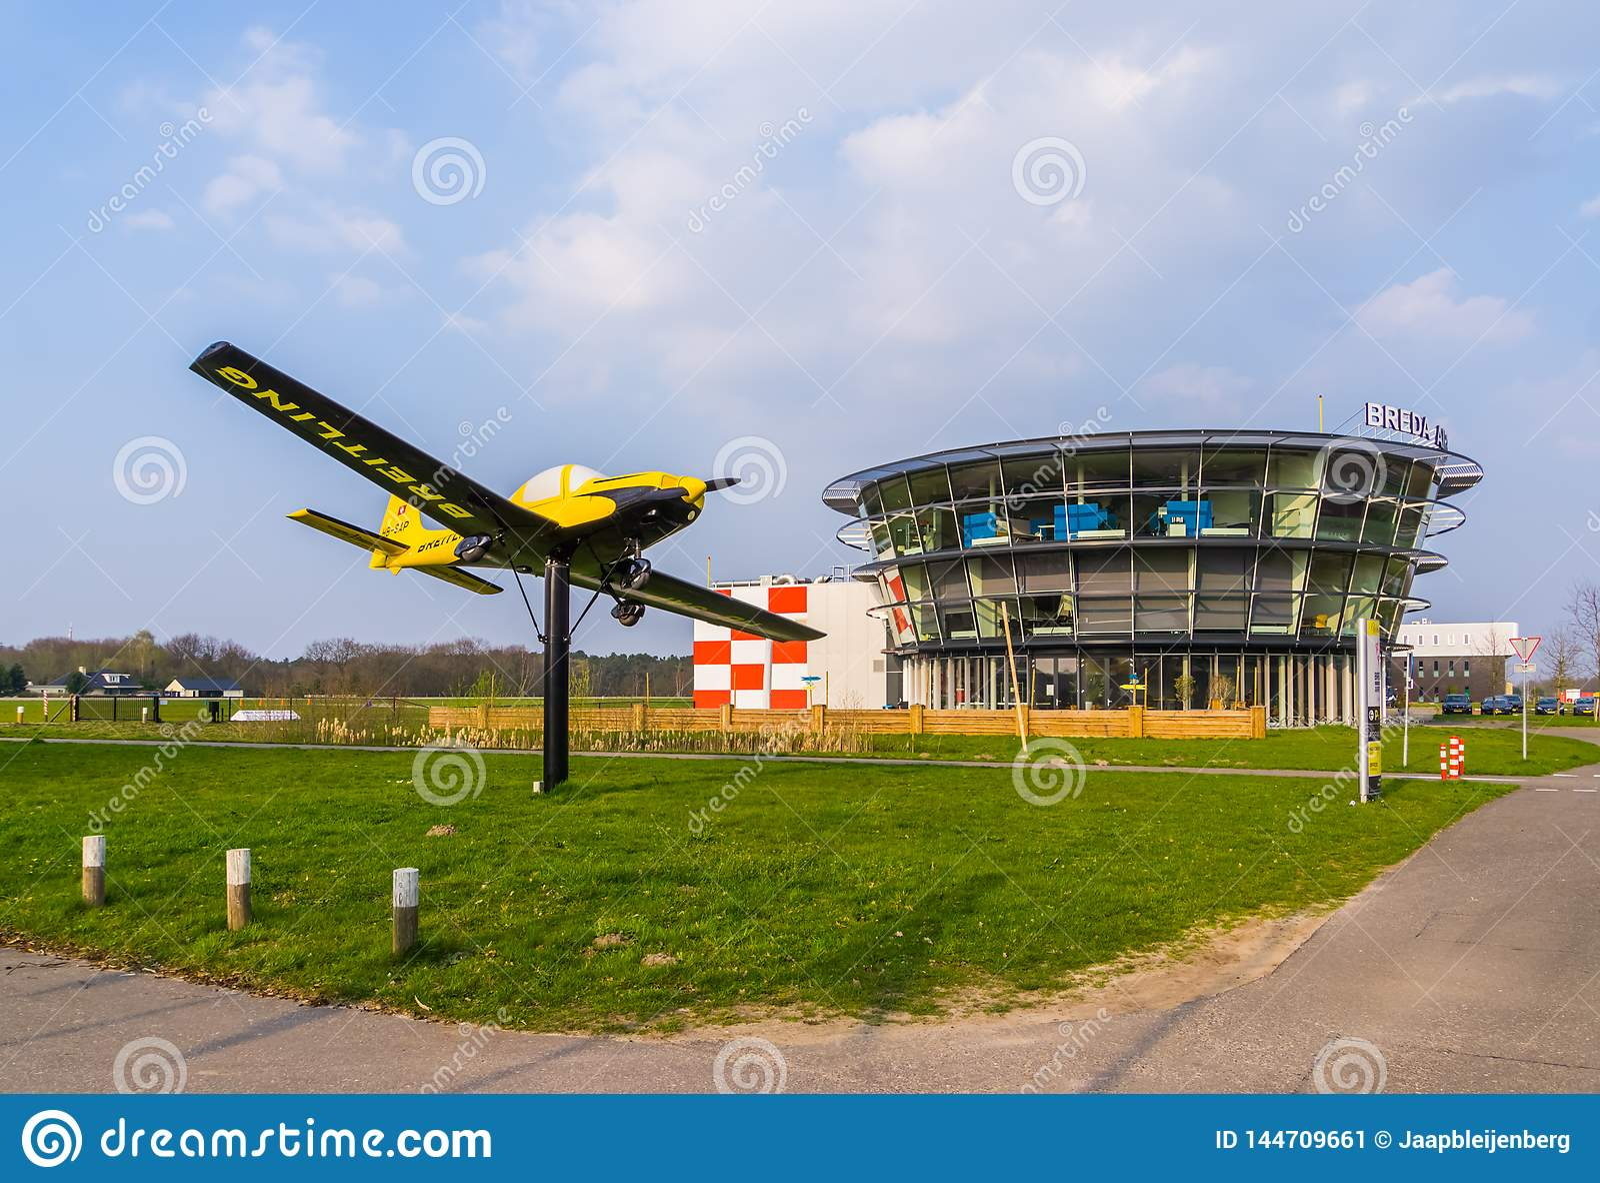 Lotnisko bosschenhoofd z samolotem, lotnictwa seppe Breda holandie, Marzec 30, 2019